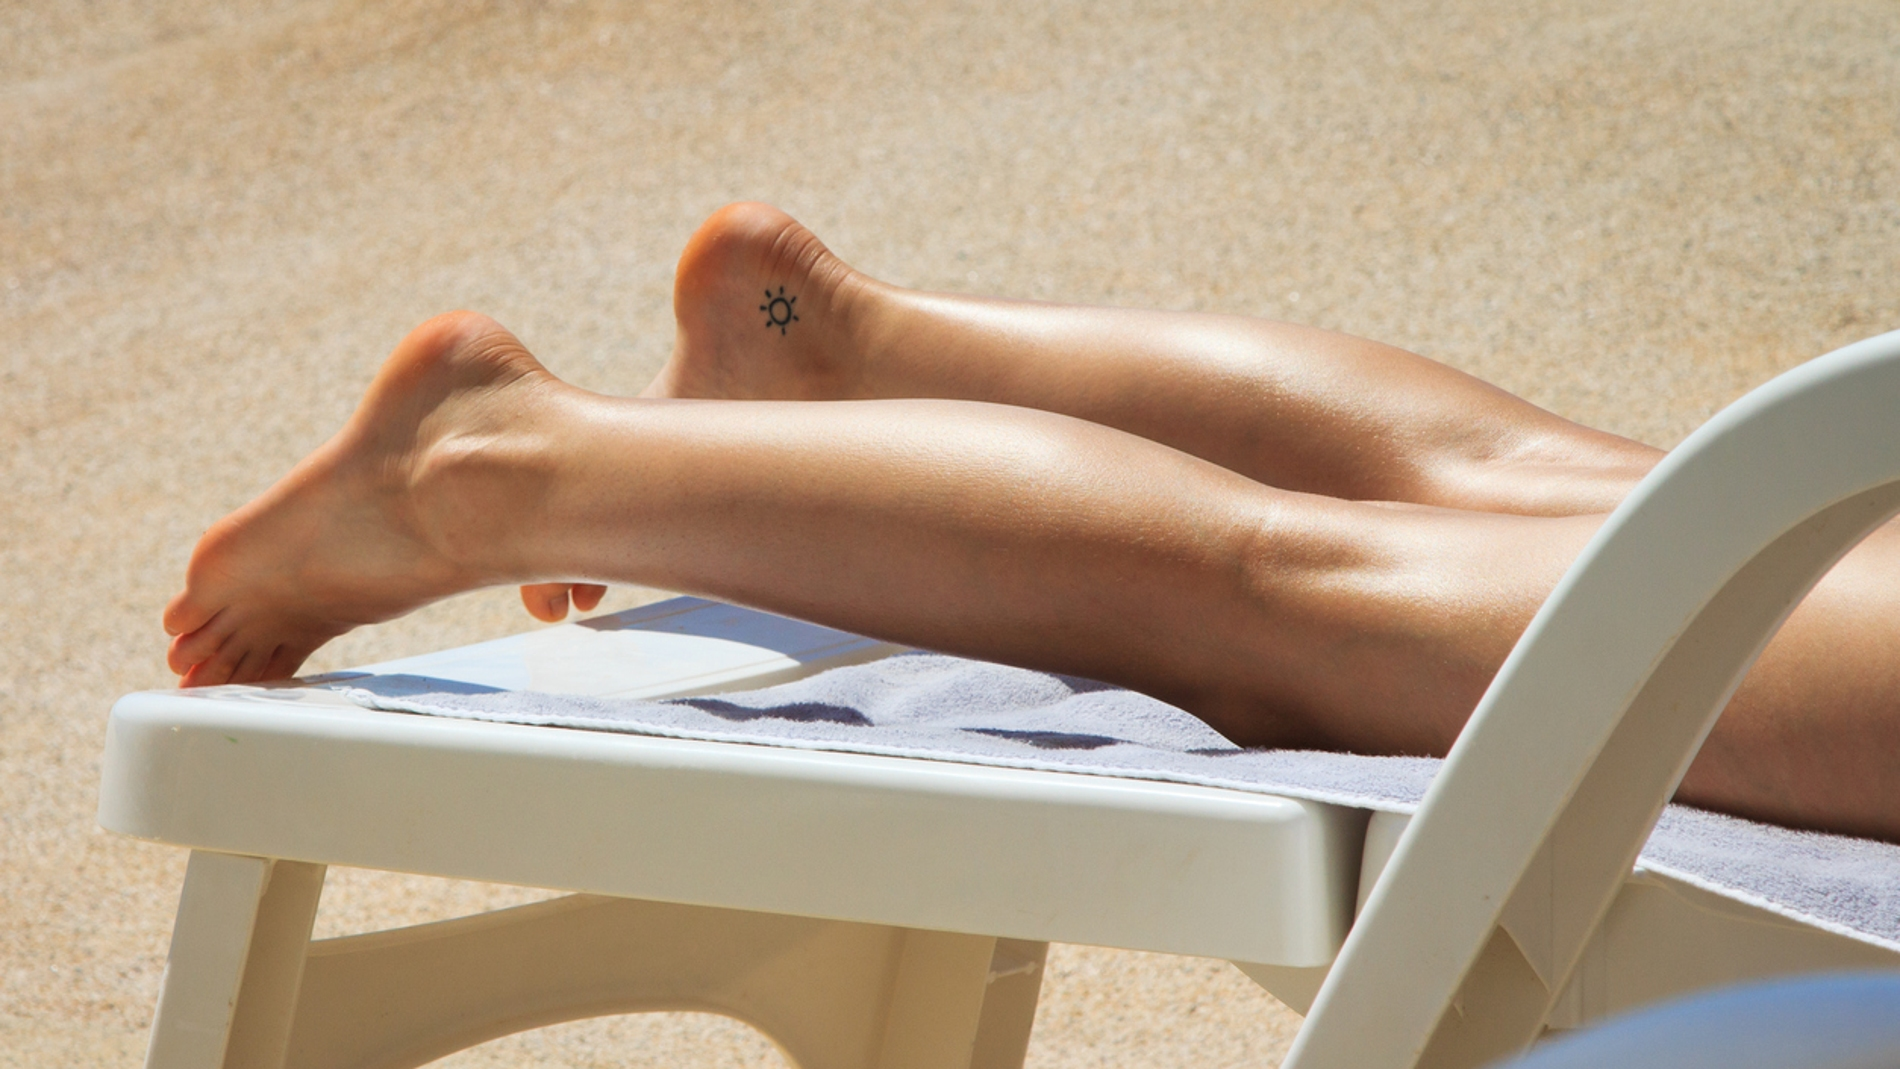 Mujer con tatuaje toma el sol